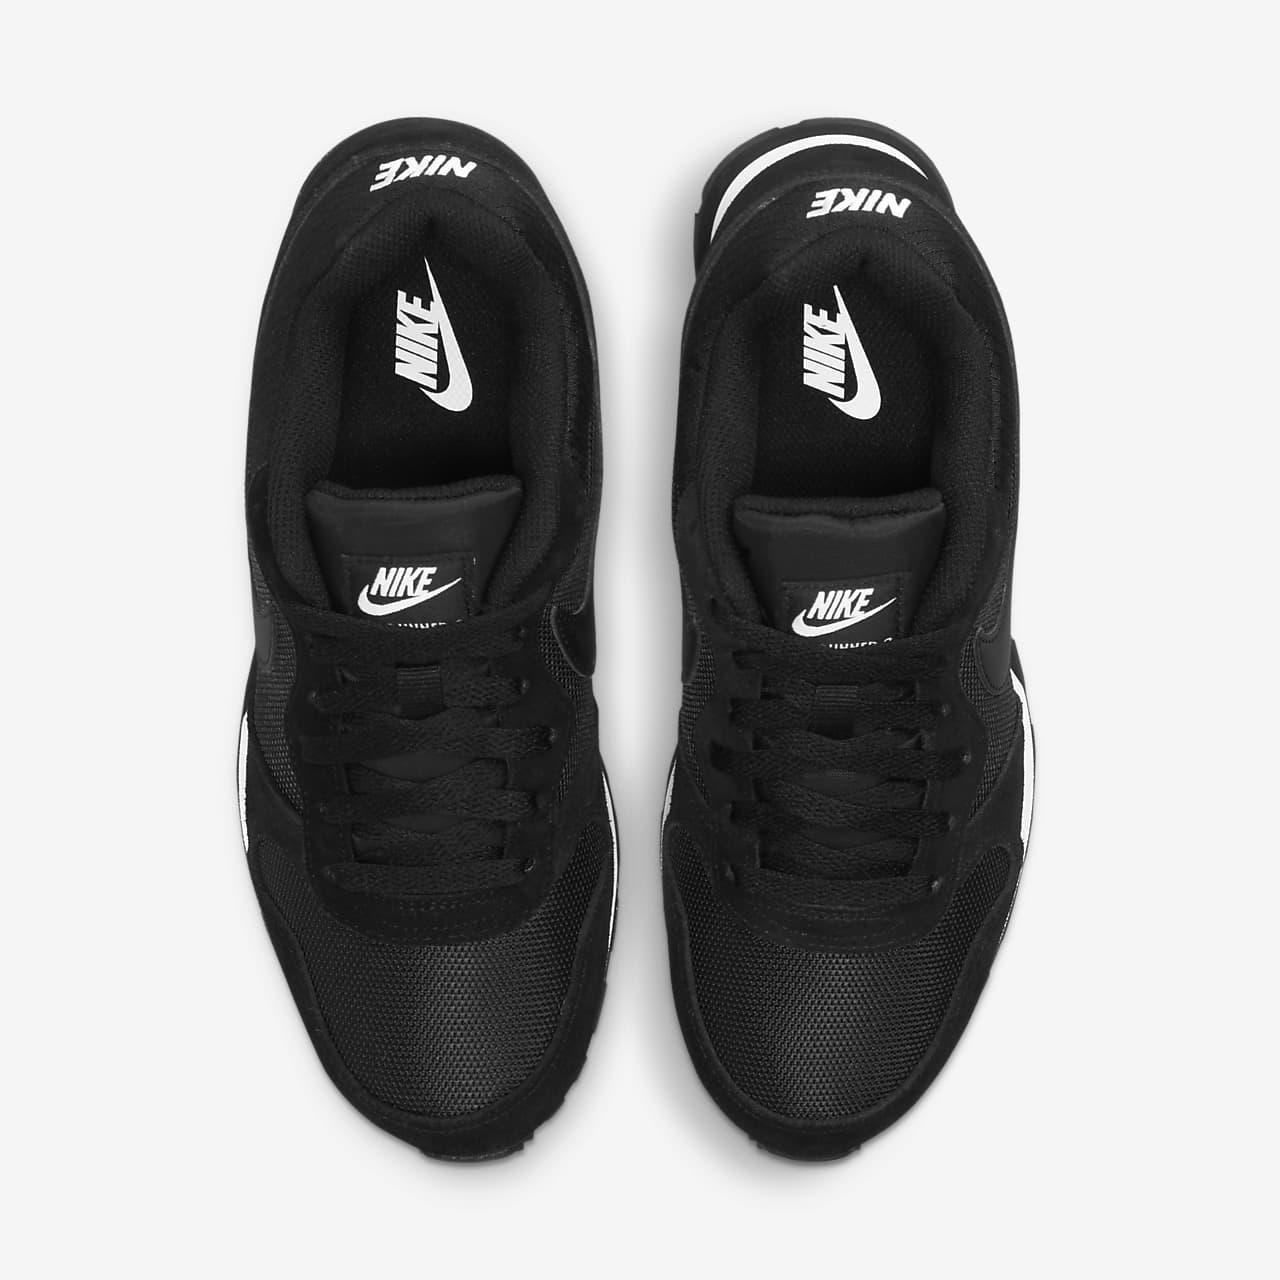 77d7c1509 Sapatilhas Nike MD Runner 2 para mulher. Nike.com PT